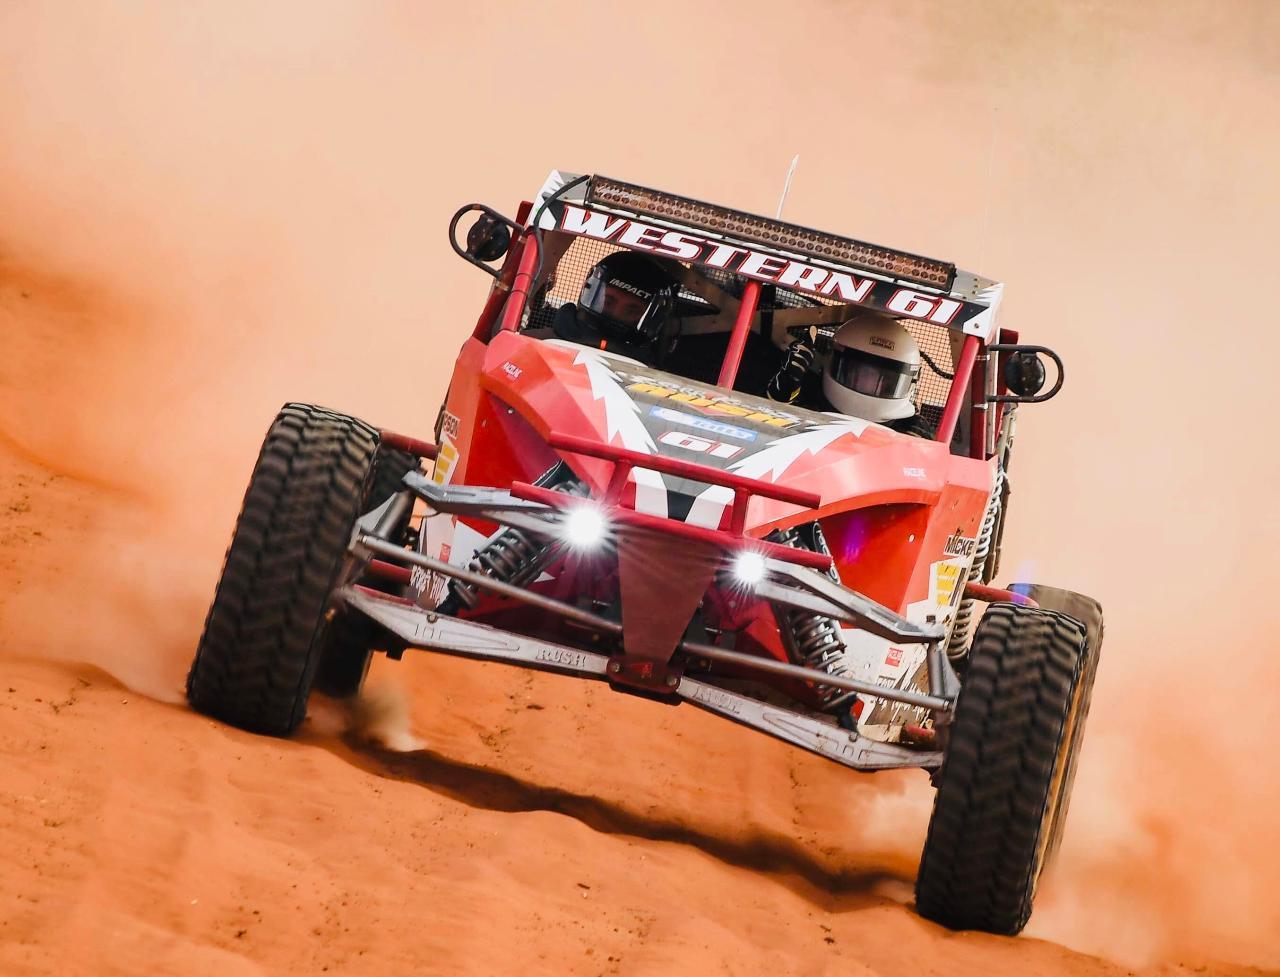 Gold Coast - V8 Buggy Intro Drive - 10 Drive Laps + 2 Hot Laps